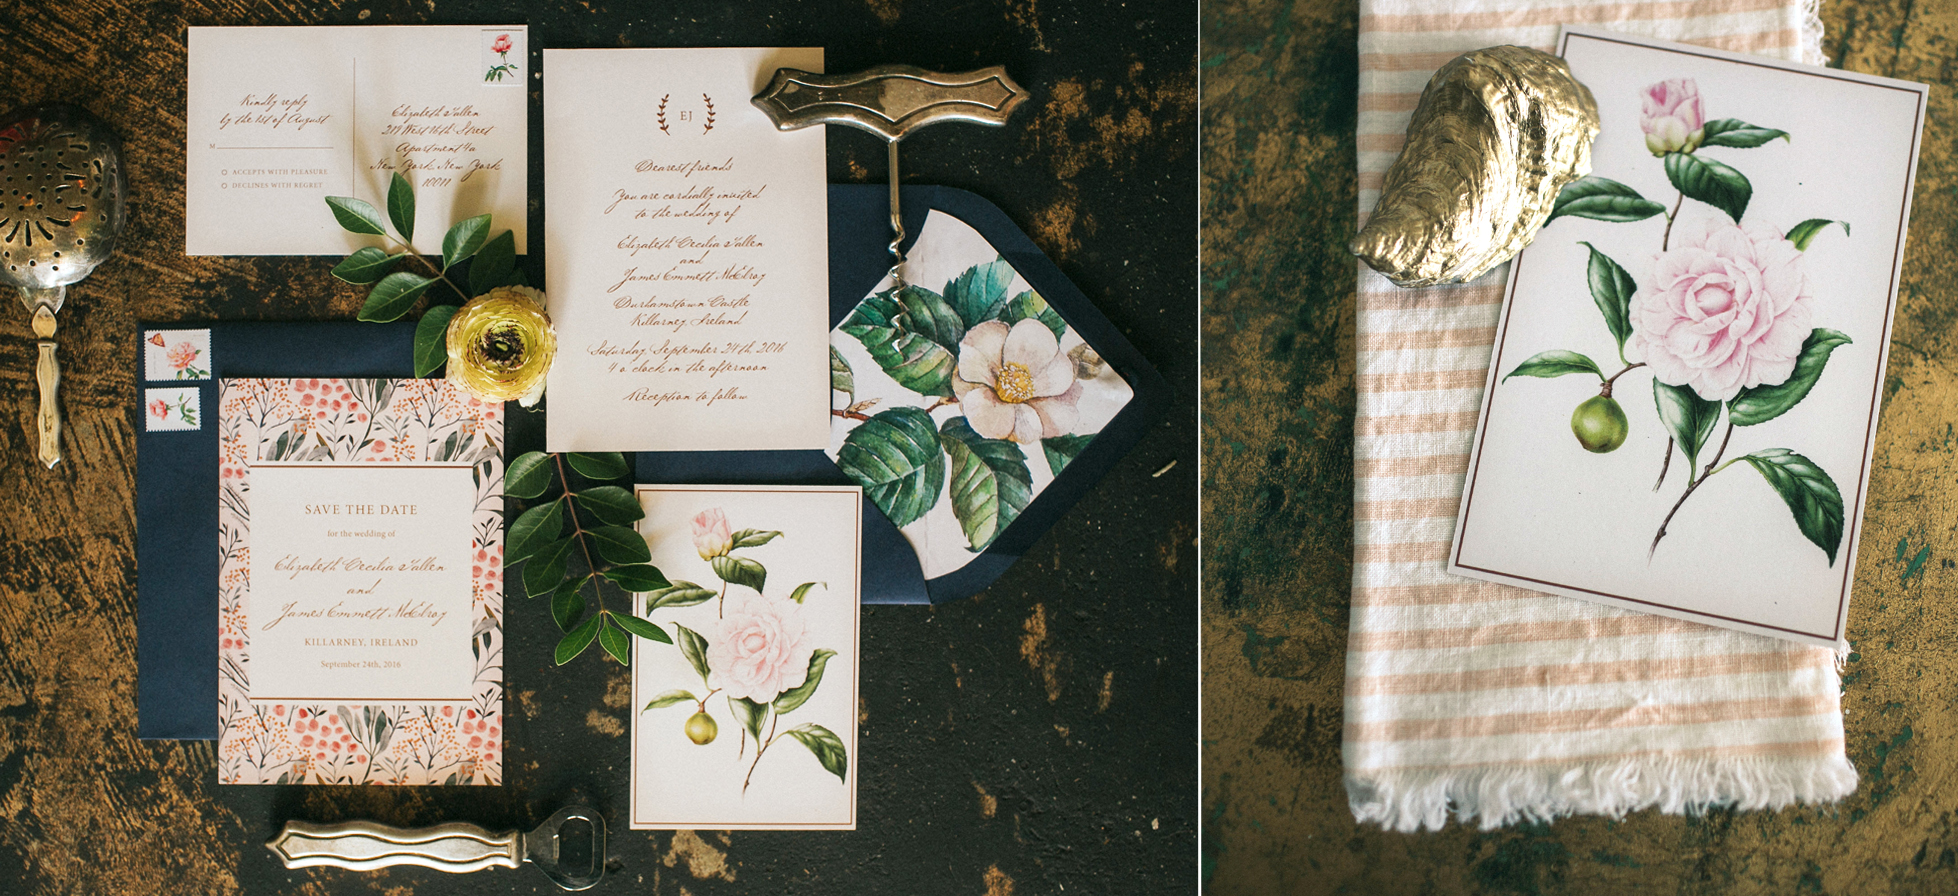 Custom Wedding Invitation Design - Austin, Texas - Fine Day Press